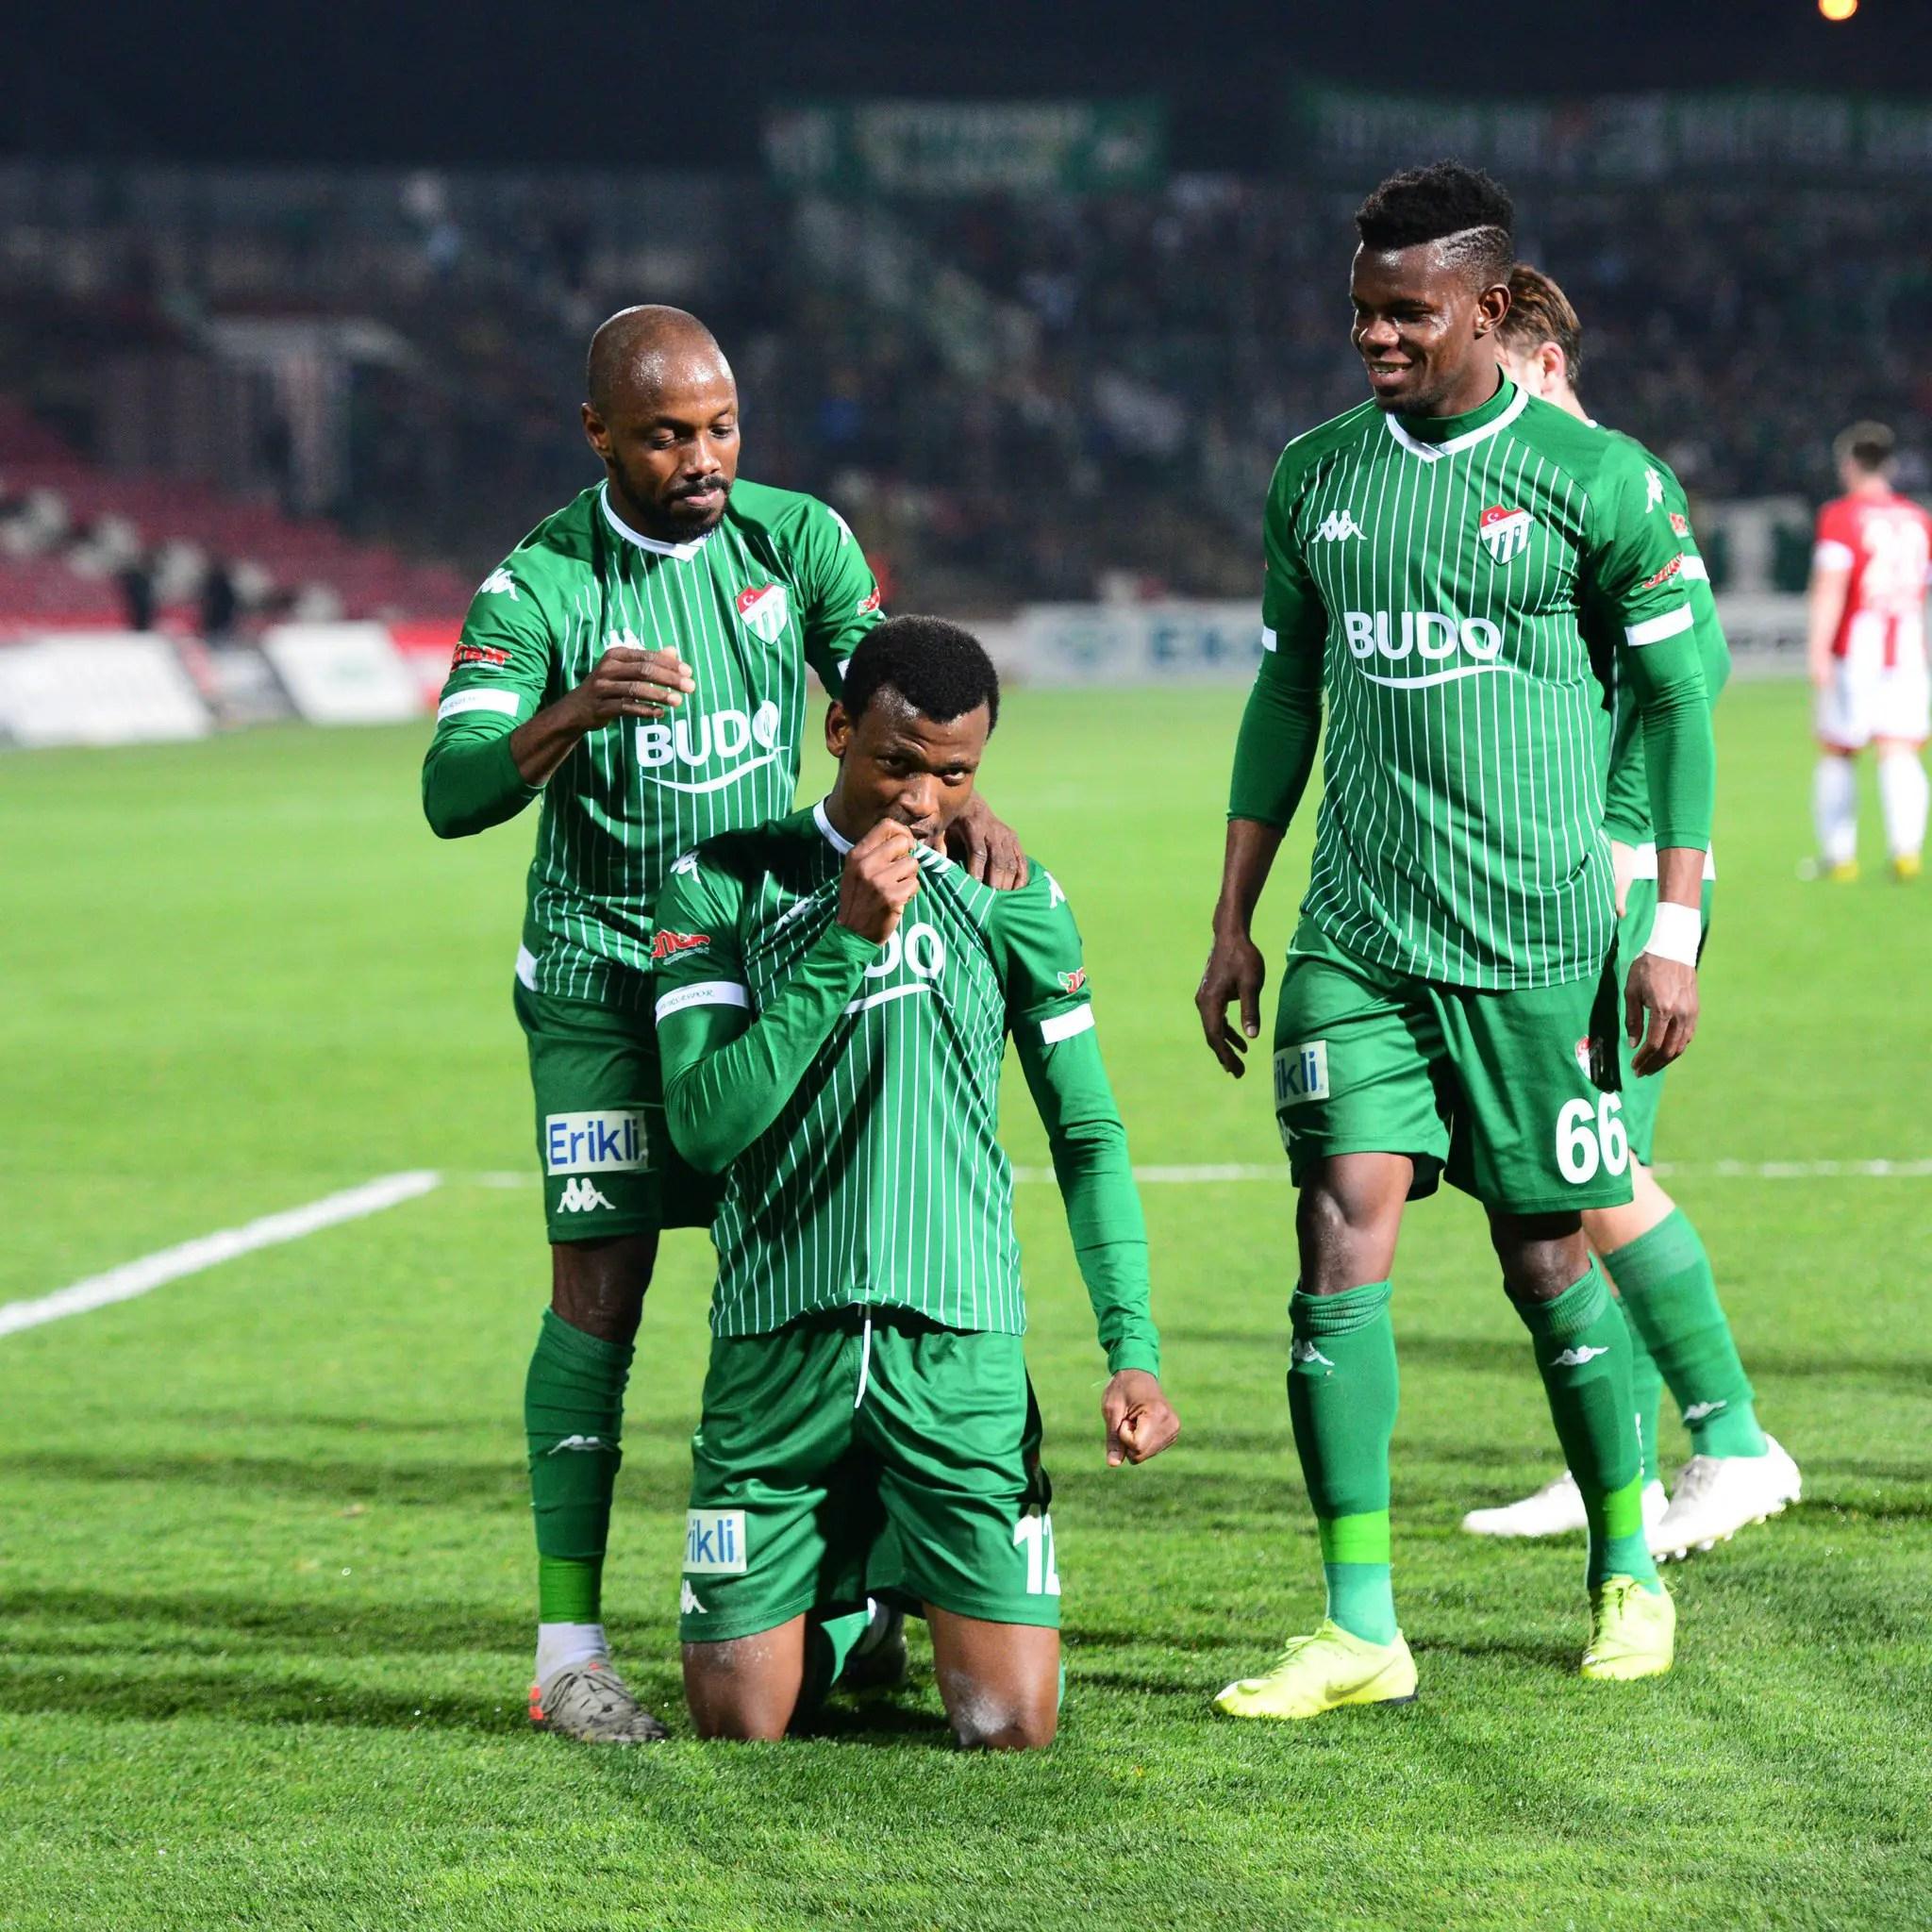 Abdullahi  Dedicates Goal In Away Win Vs Balikesirspor To Bursaspor Fans